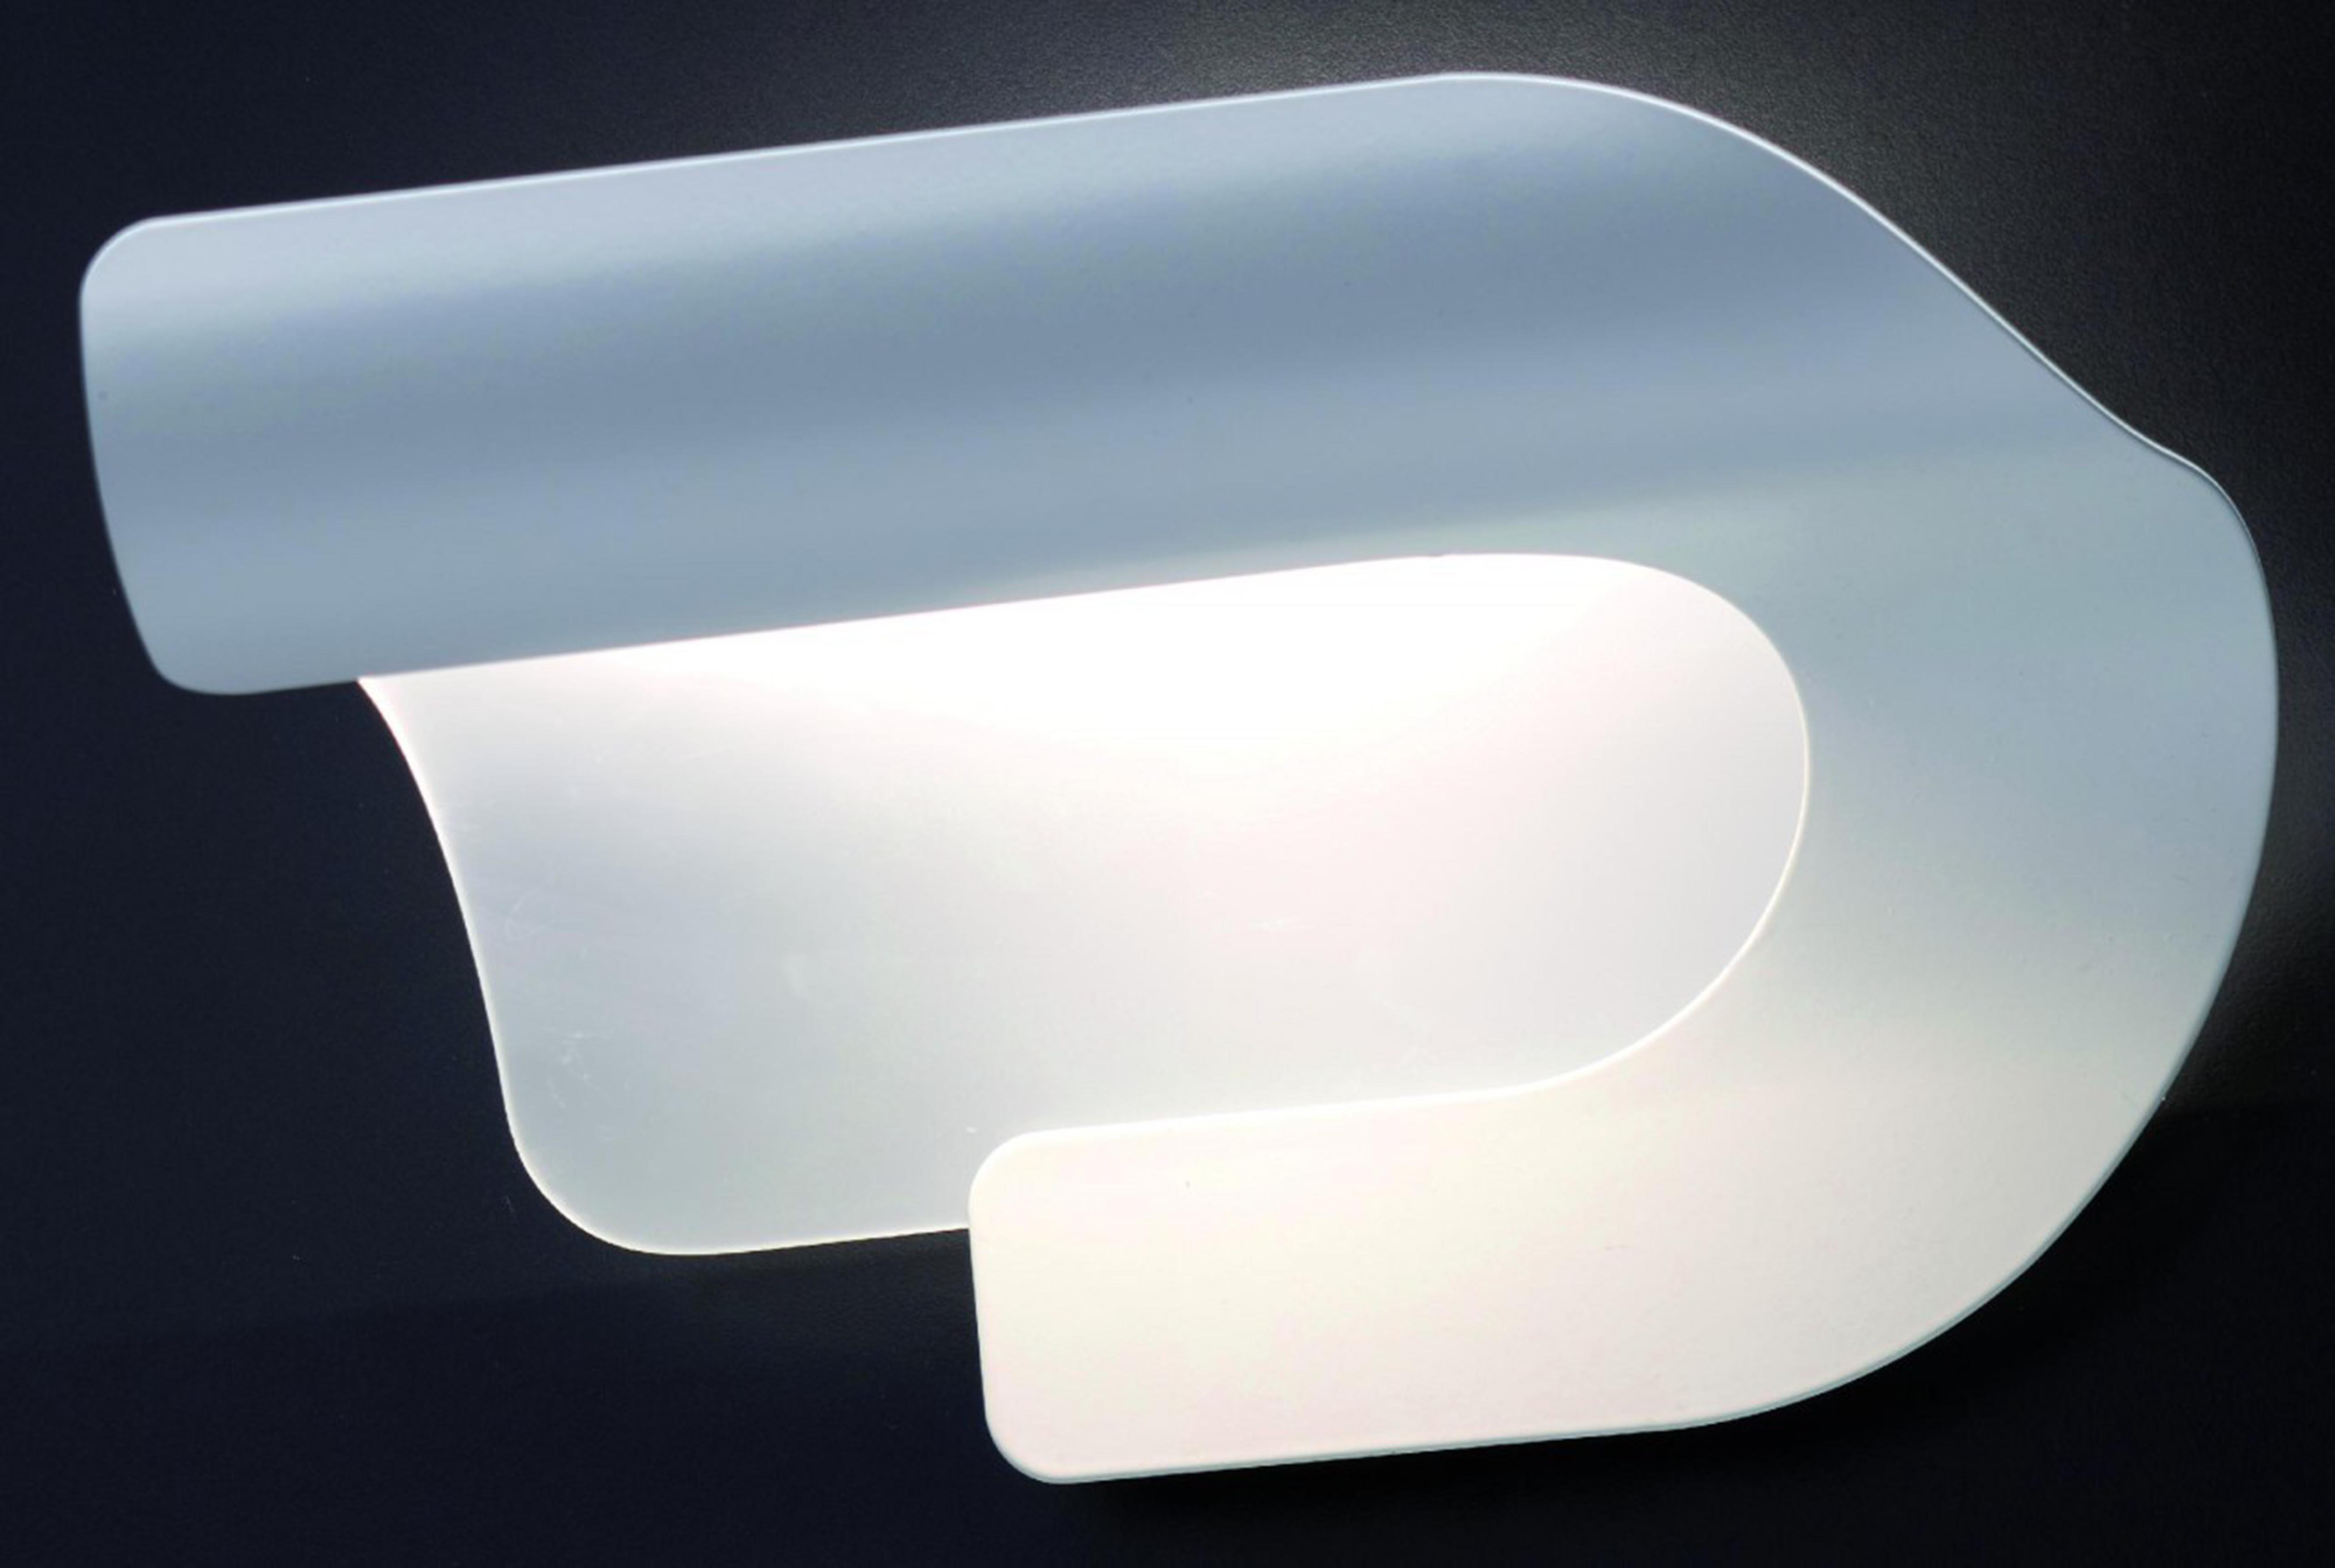 Lampadario Bianco Opaco : Sikrea lampada da parete syrio led colore bianco opaco